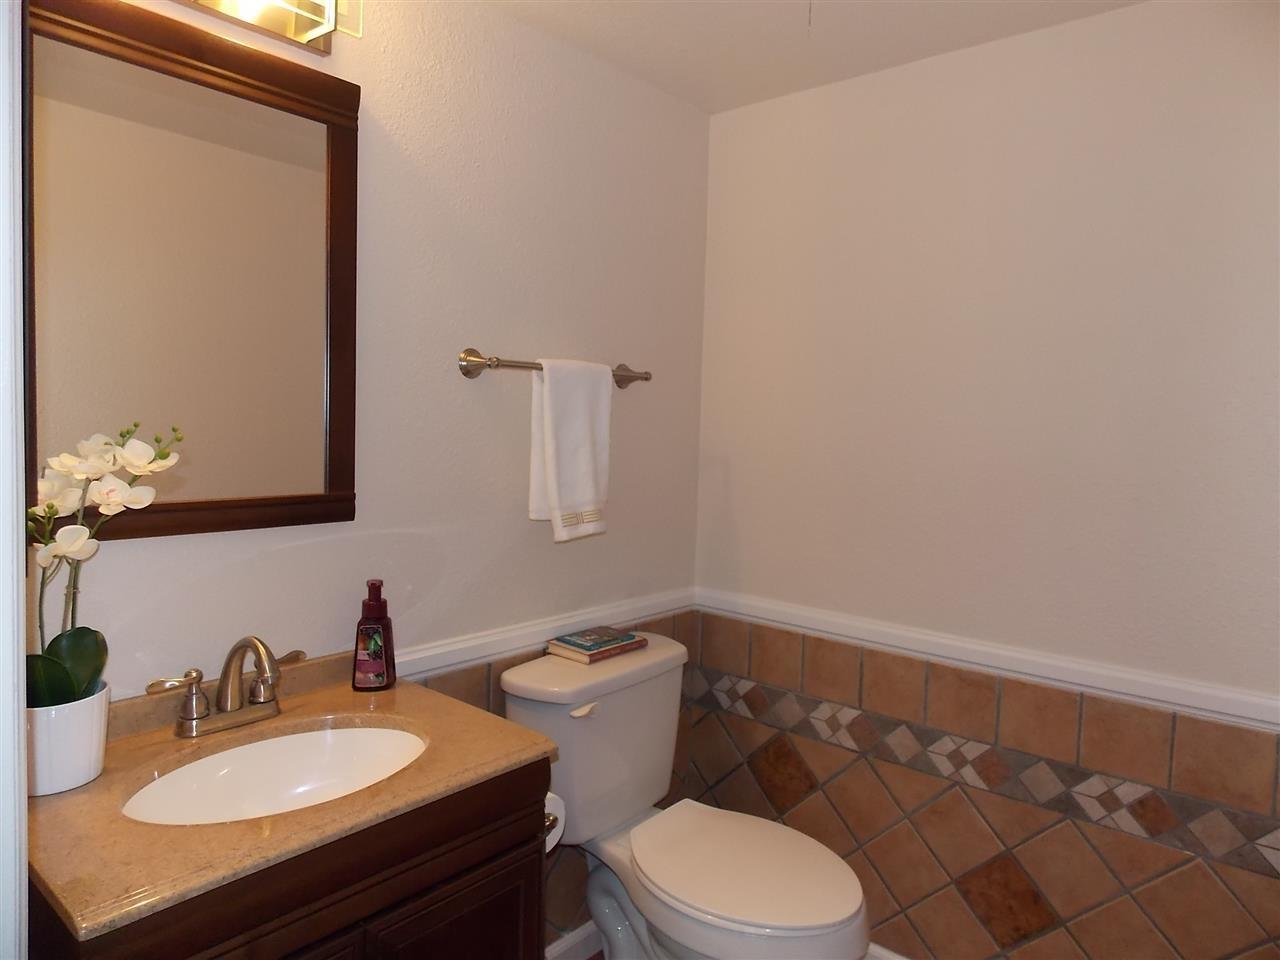 0San Diego Bathroom Design Amazing 5250 Marigot Pl San Diego Ca 92124  Mls# 140058889  Redfin Decorating Design